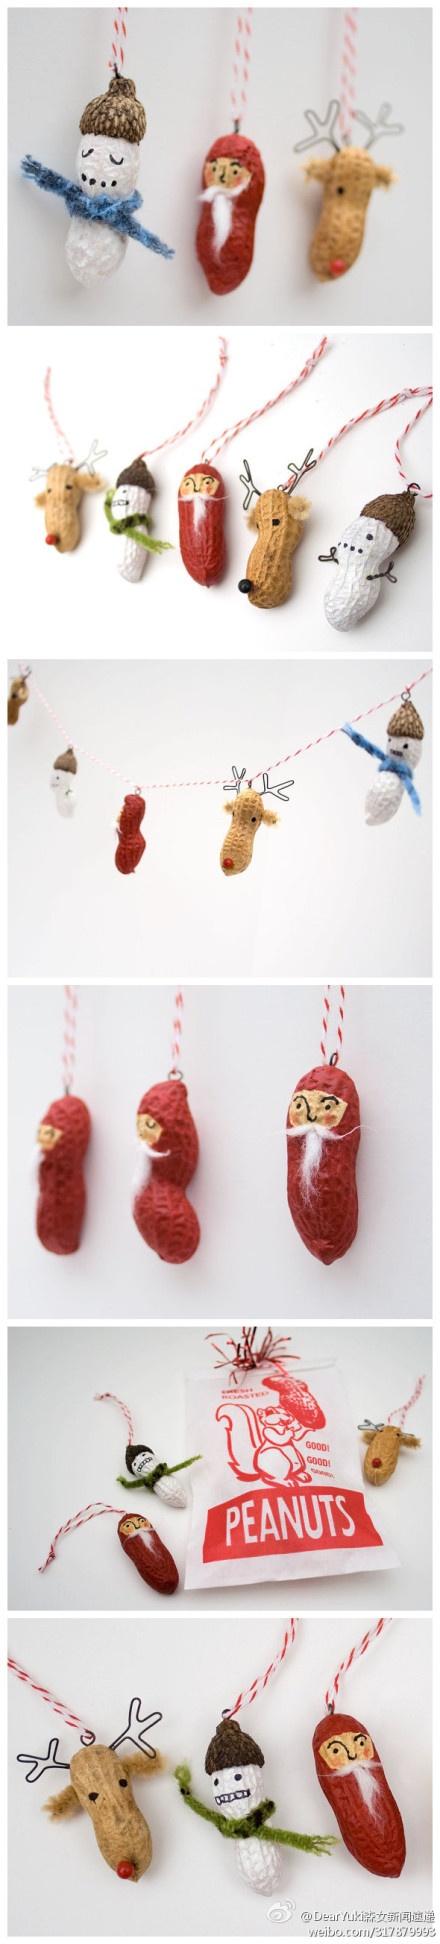 ...more peanut ornament inspiration